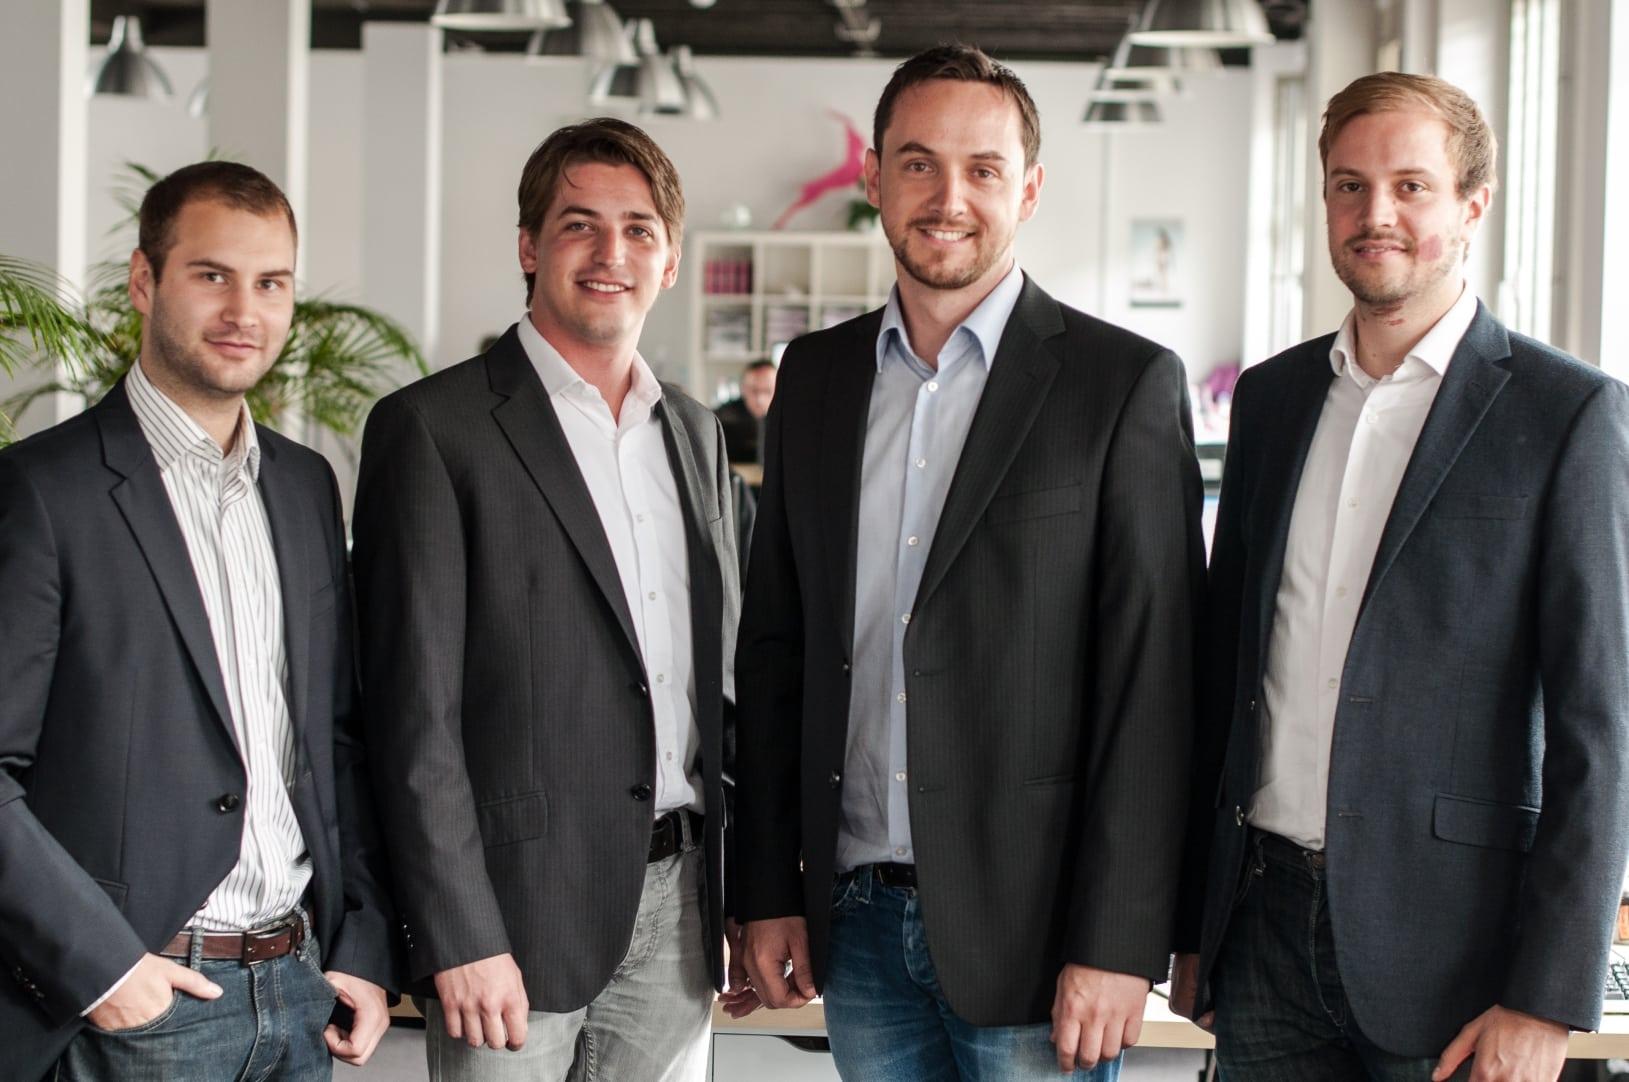 The Founders of Signavio – from left: Torben Schreiter, Nicolas Peters, Willi Tscheschner, Gero Decker